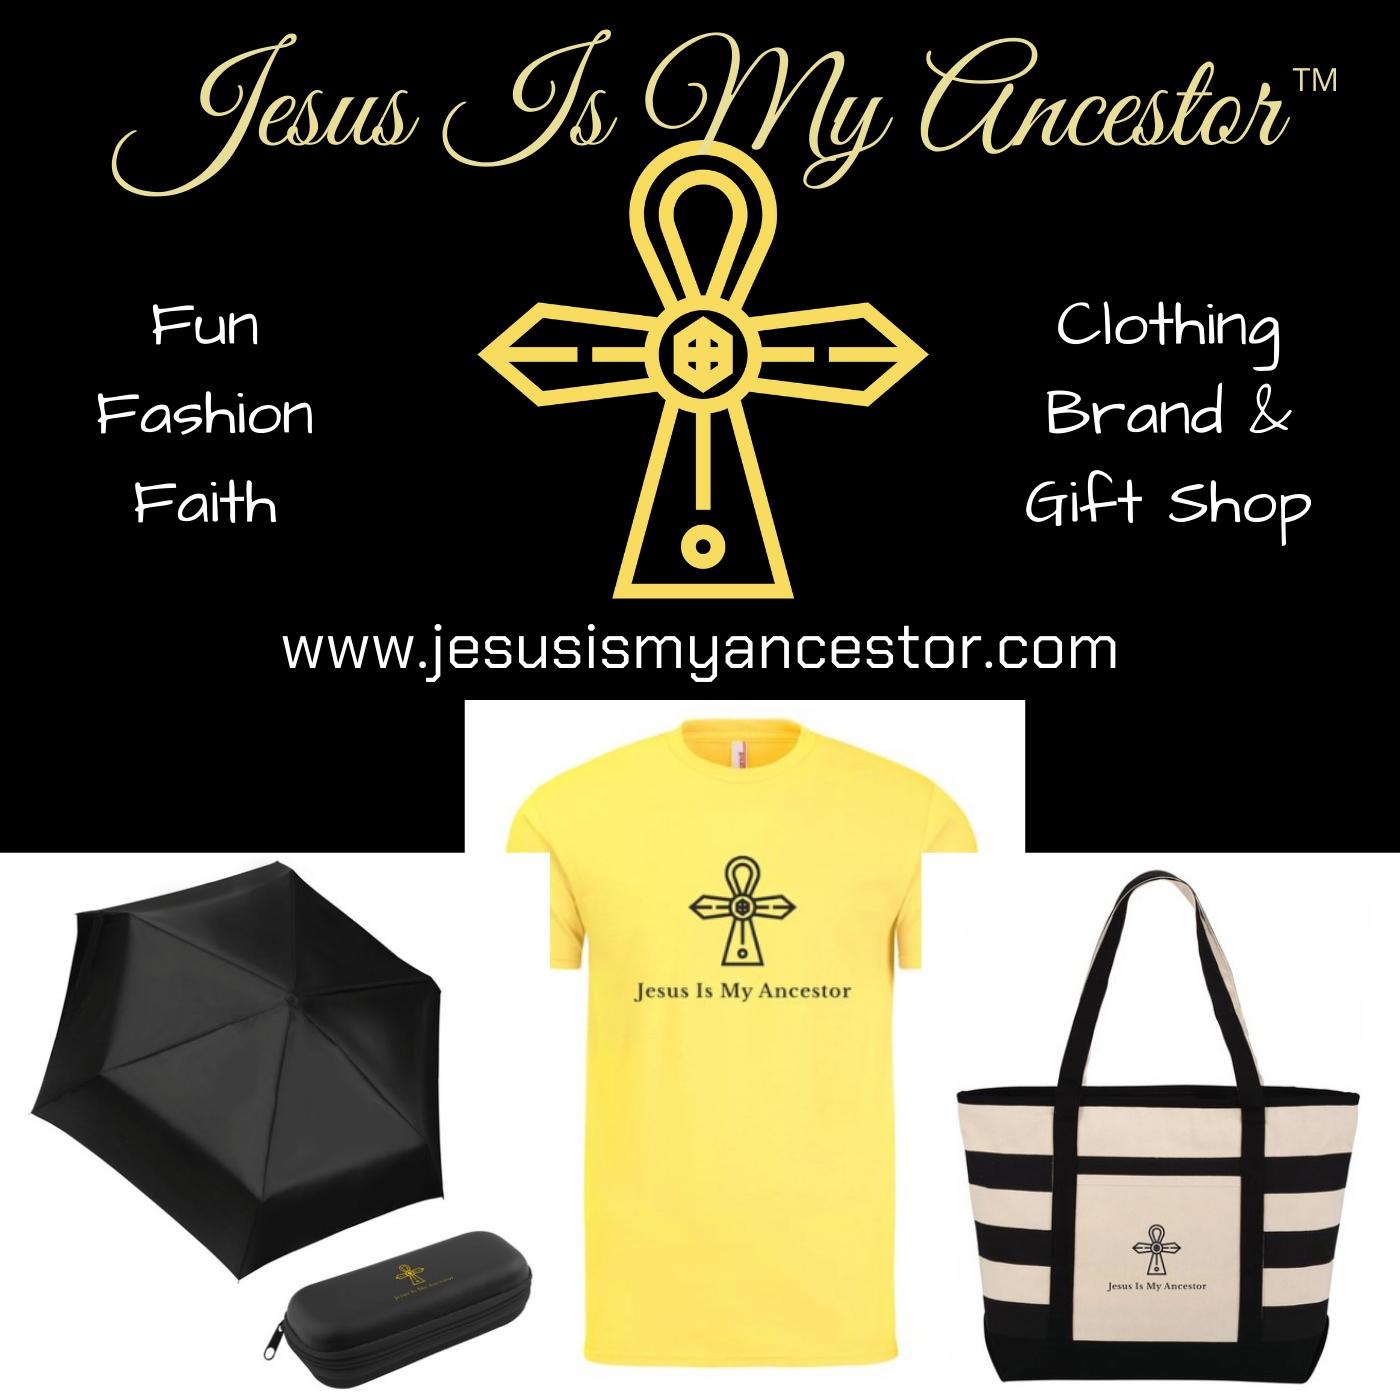 Jesus is my ancestor